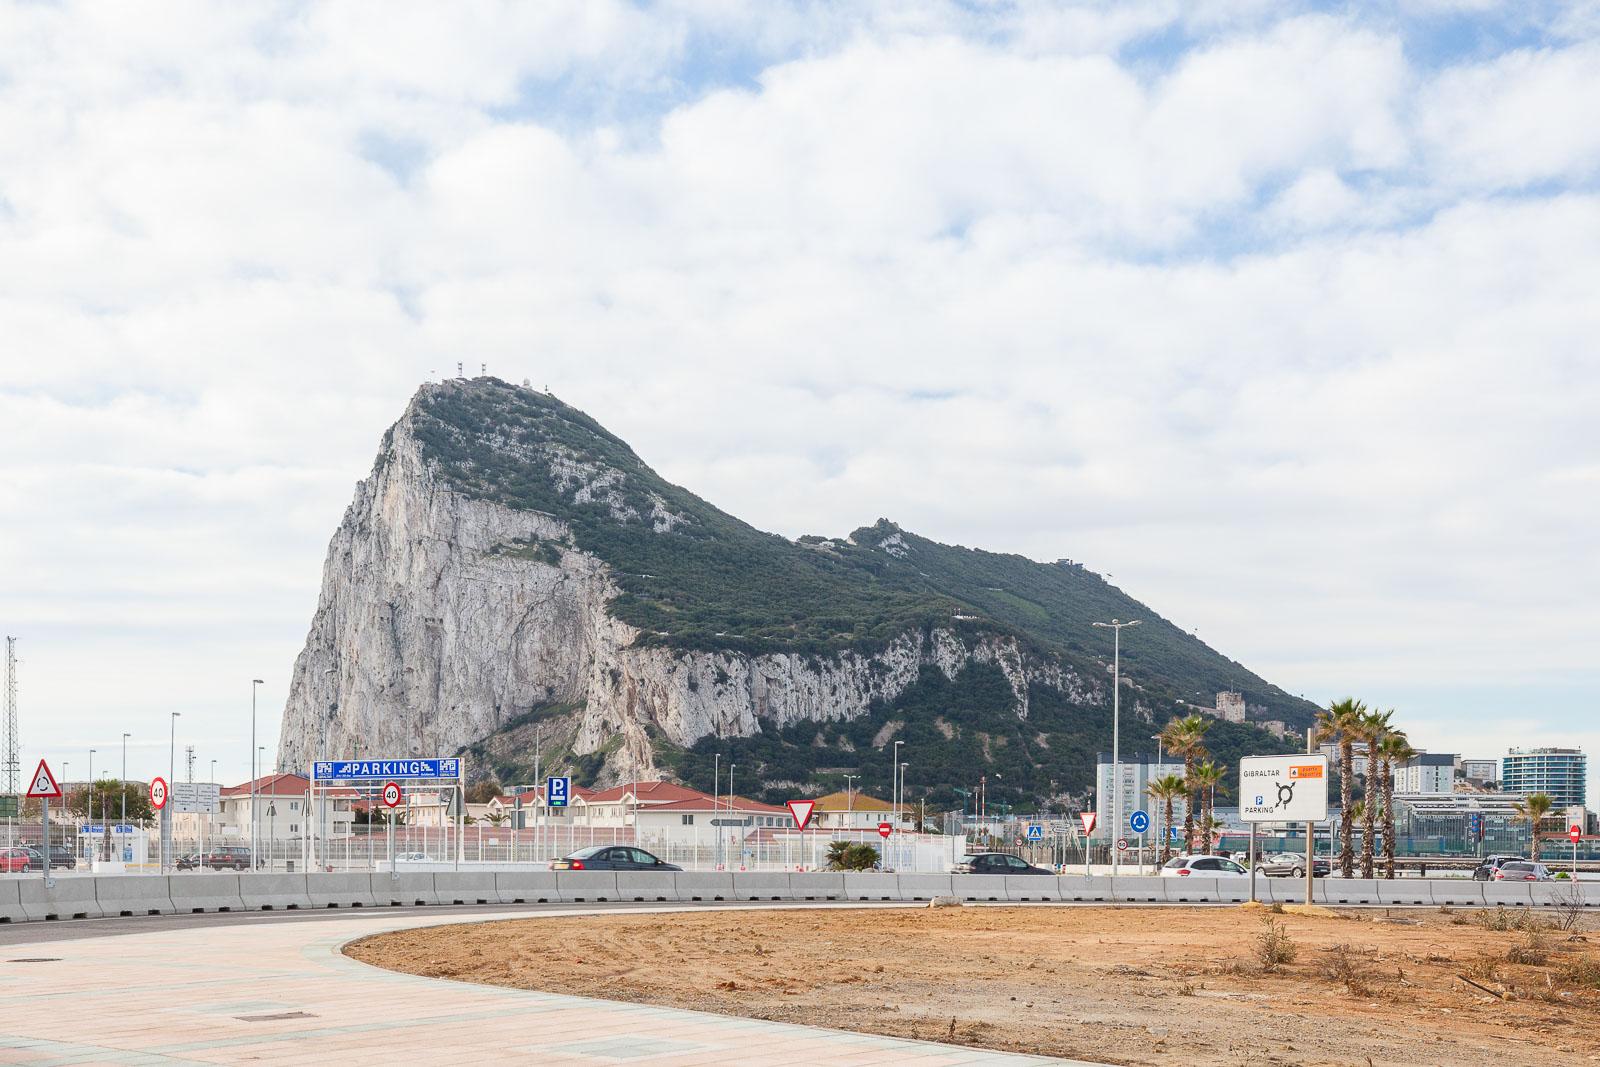 Gibraltar, movidos pelo rochedo_Num Postal